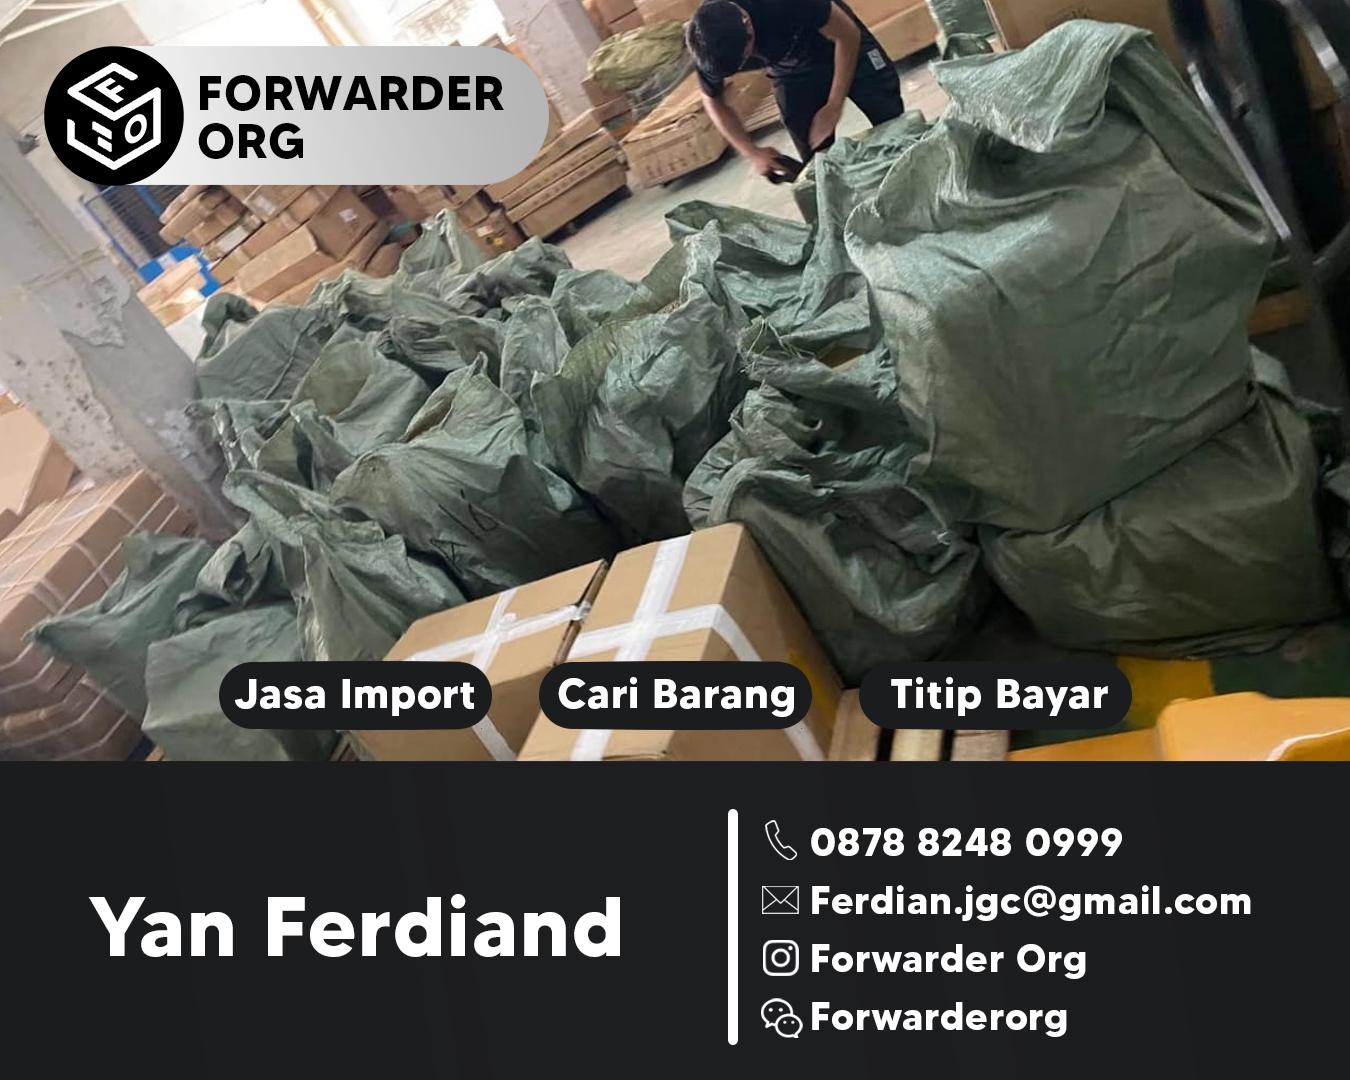 Import Barang dari China Terpercaya dan Termurah | FORWARDER ORG